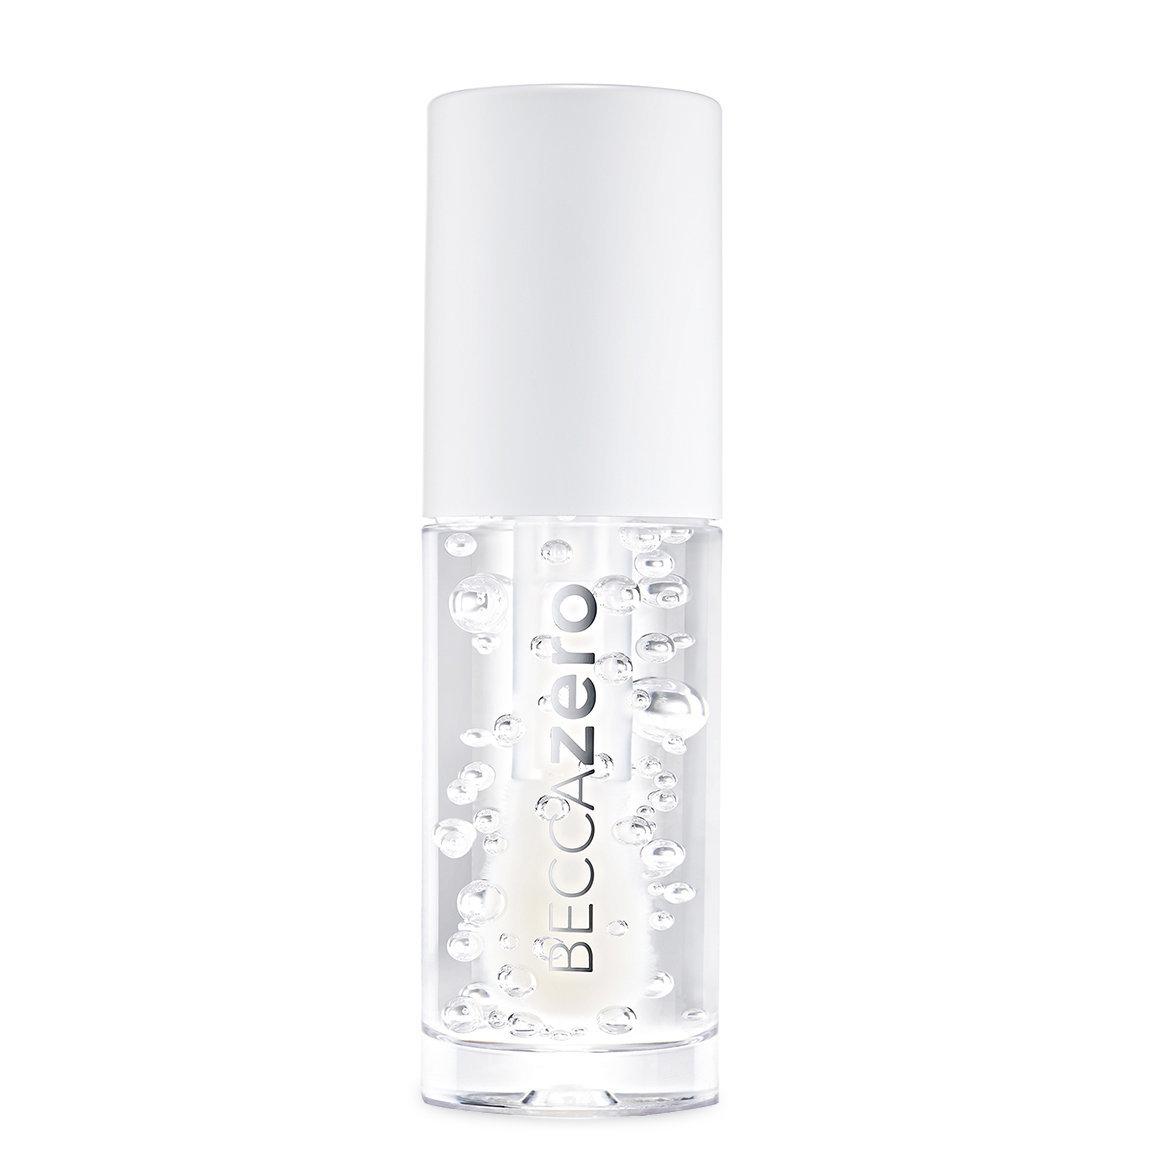 BECCA Cosmetics Zero Face & Lip Glass Highlighter alternative view 1 - product swatch.